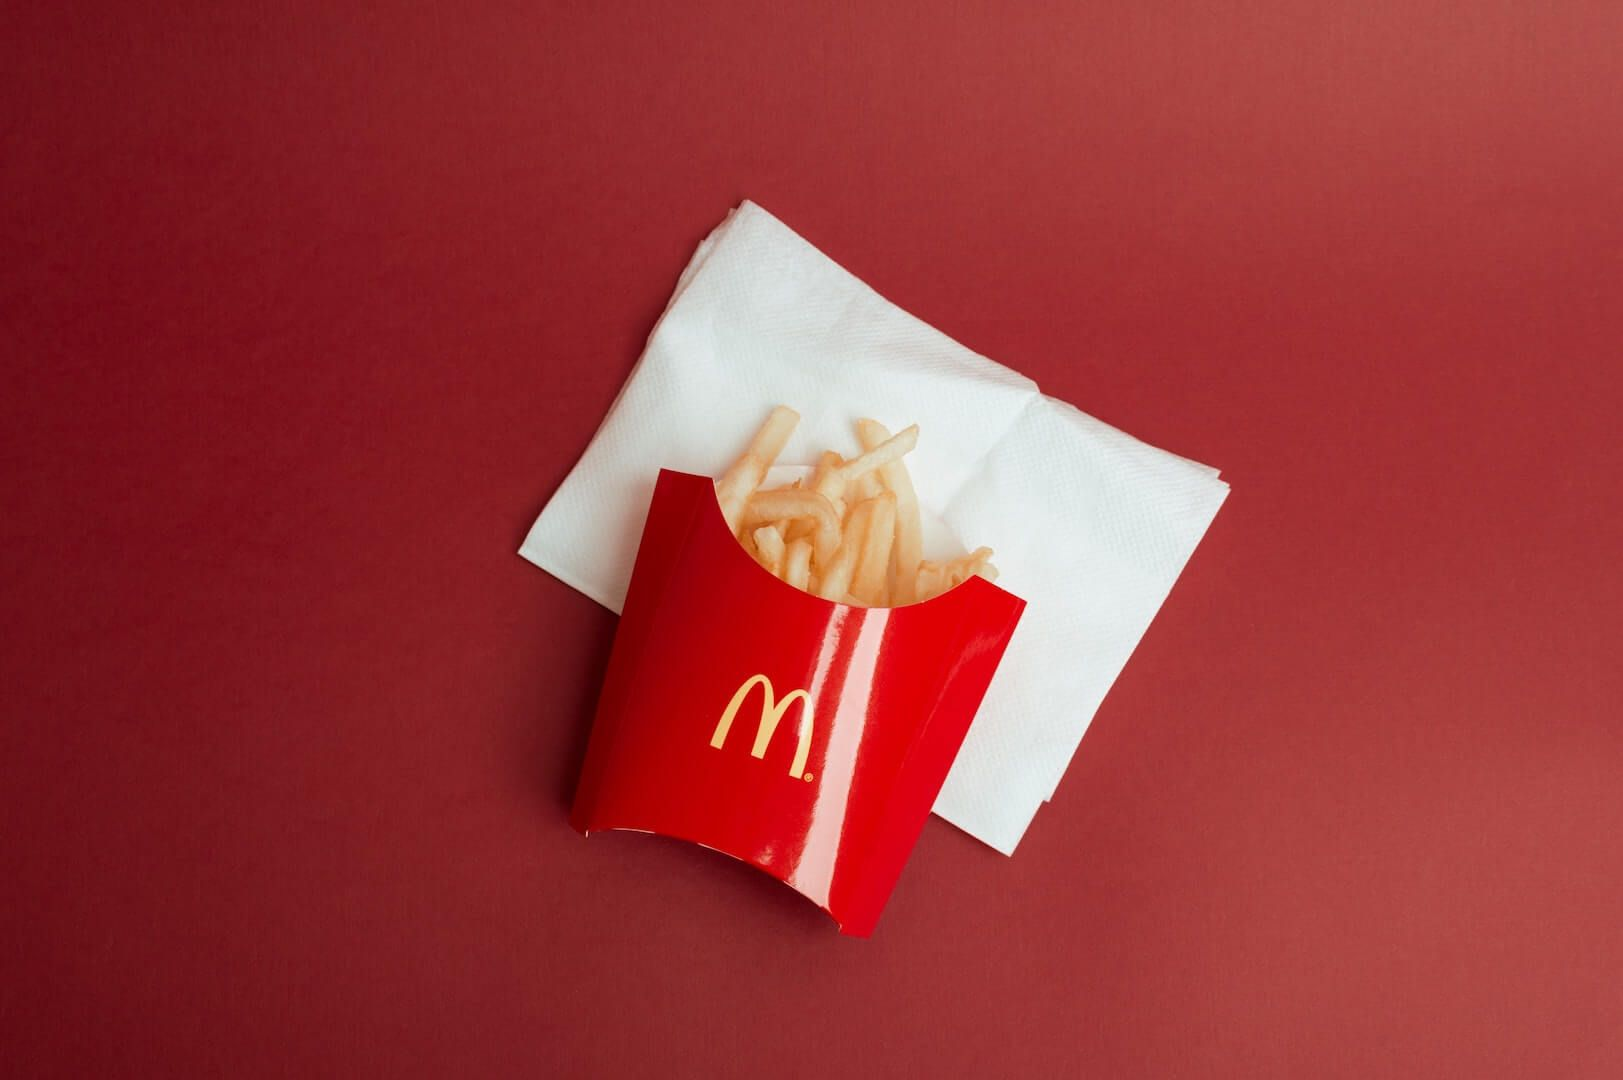 mcdonalds patat